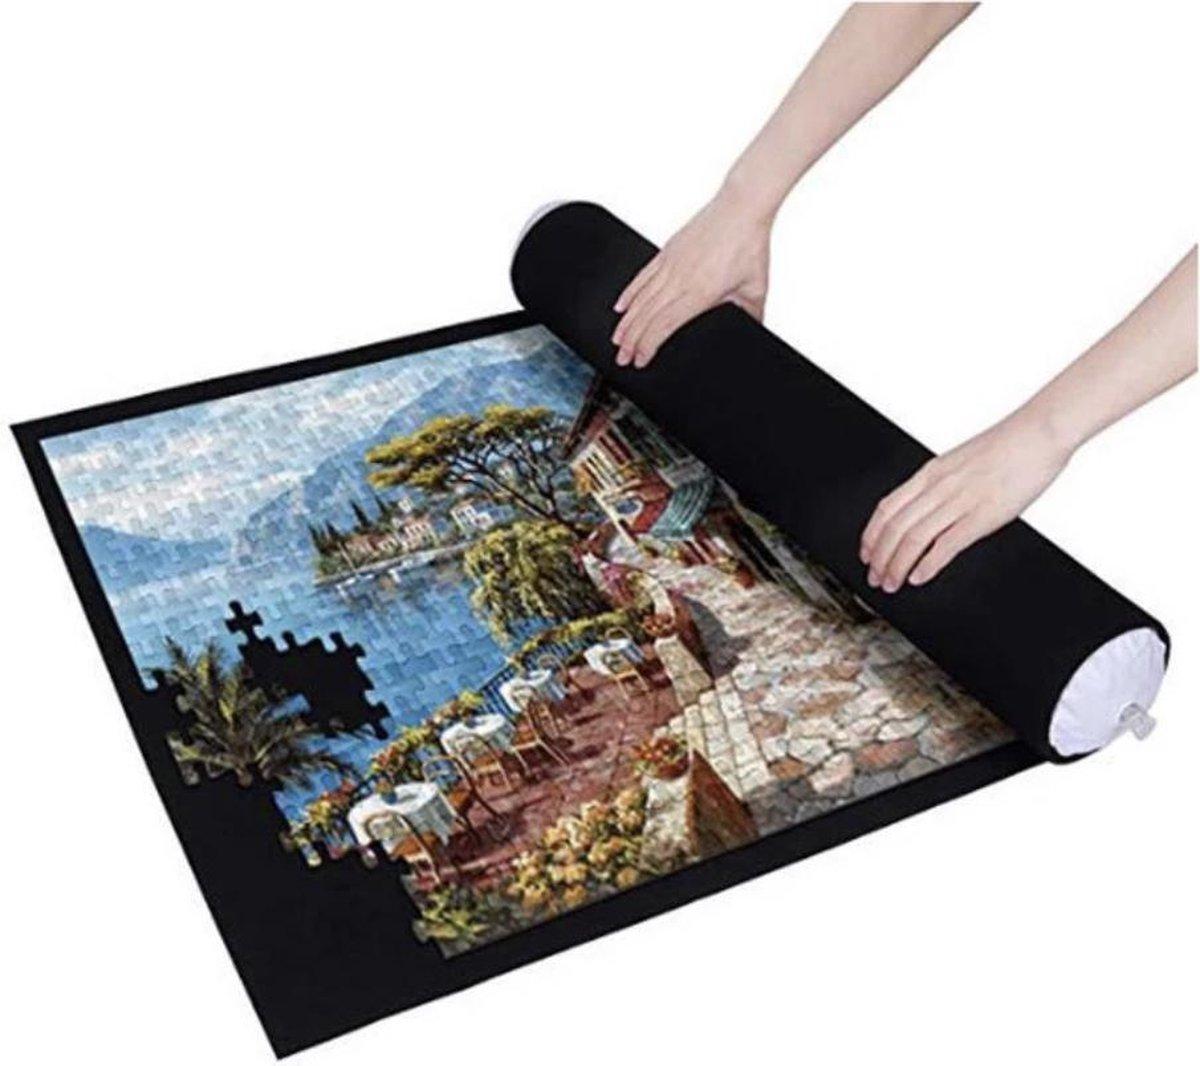 Puzzelmat set tot 1500 stukjes – Oprolbare puzzelmat inclusief hoes en pomp - Puzzelmaatje